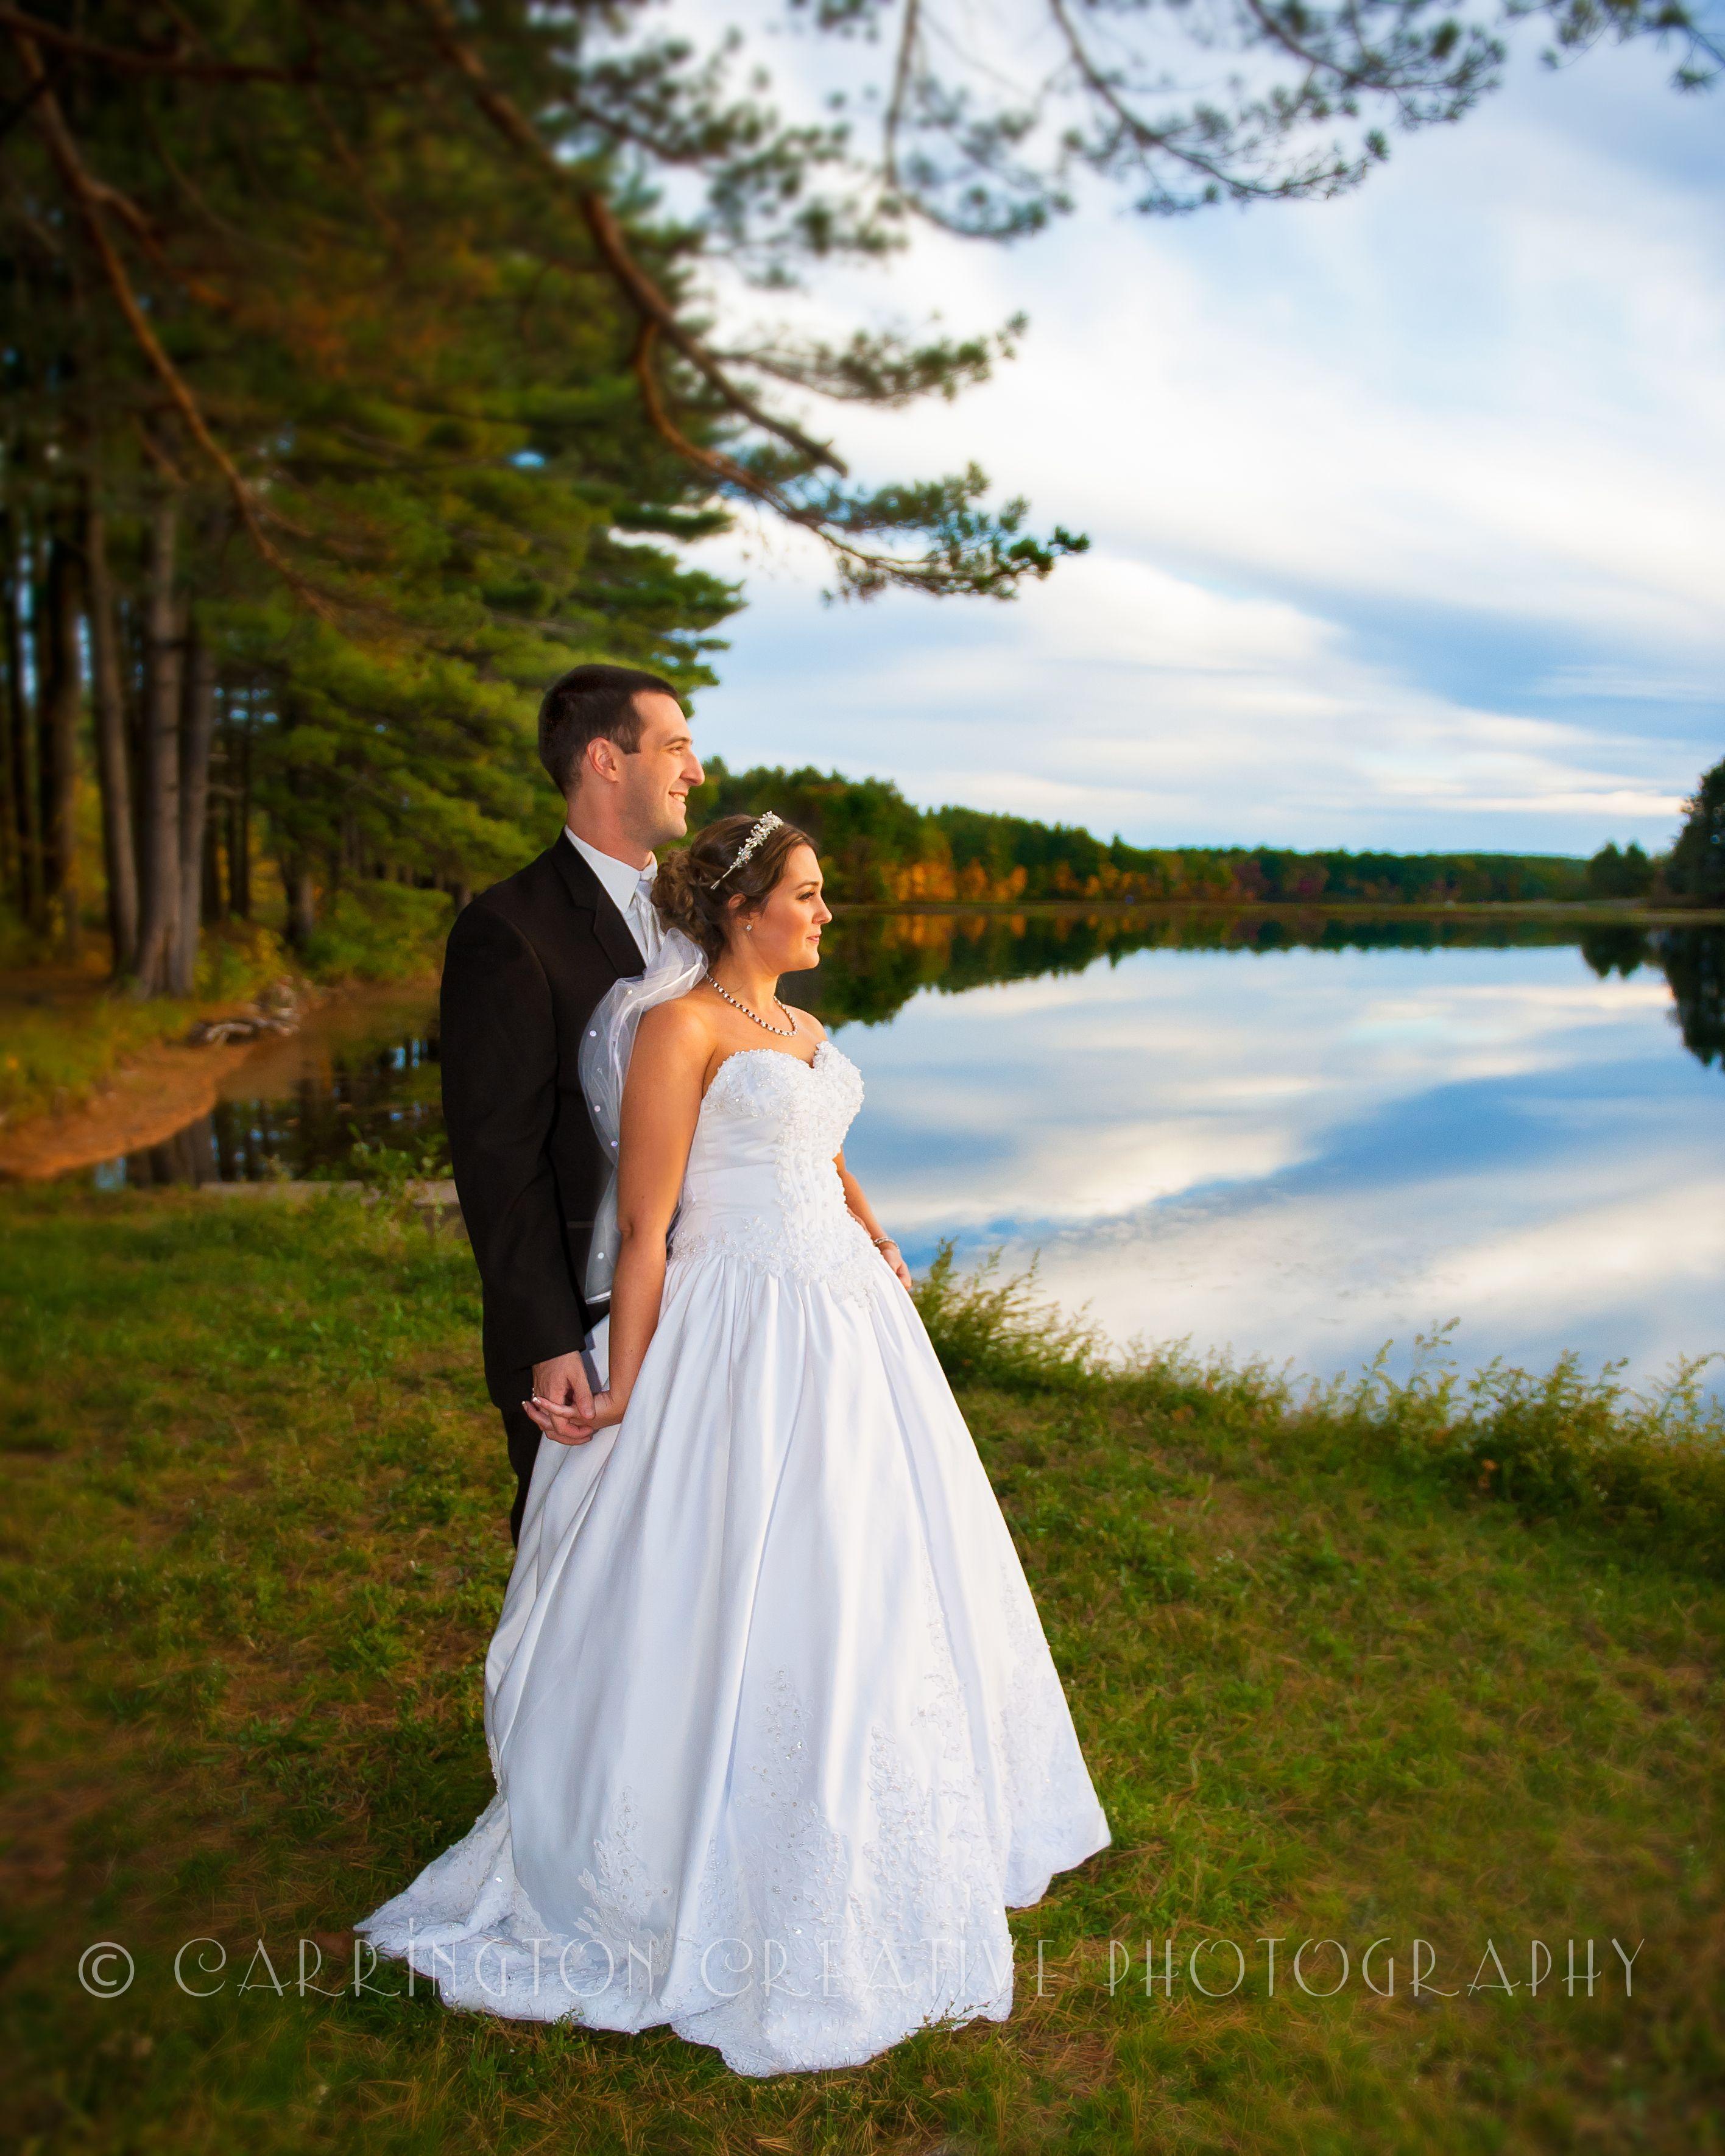 Bride. Groom. Beautiful View... Wedding Photography by Carrington Creative Photography